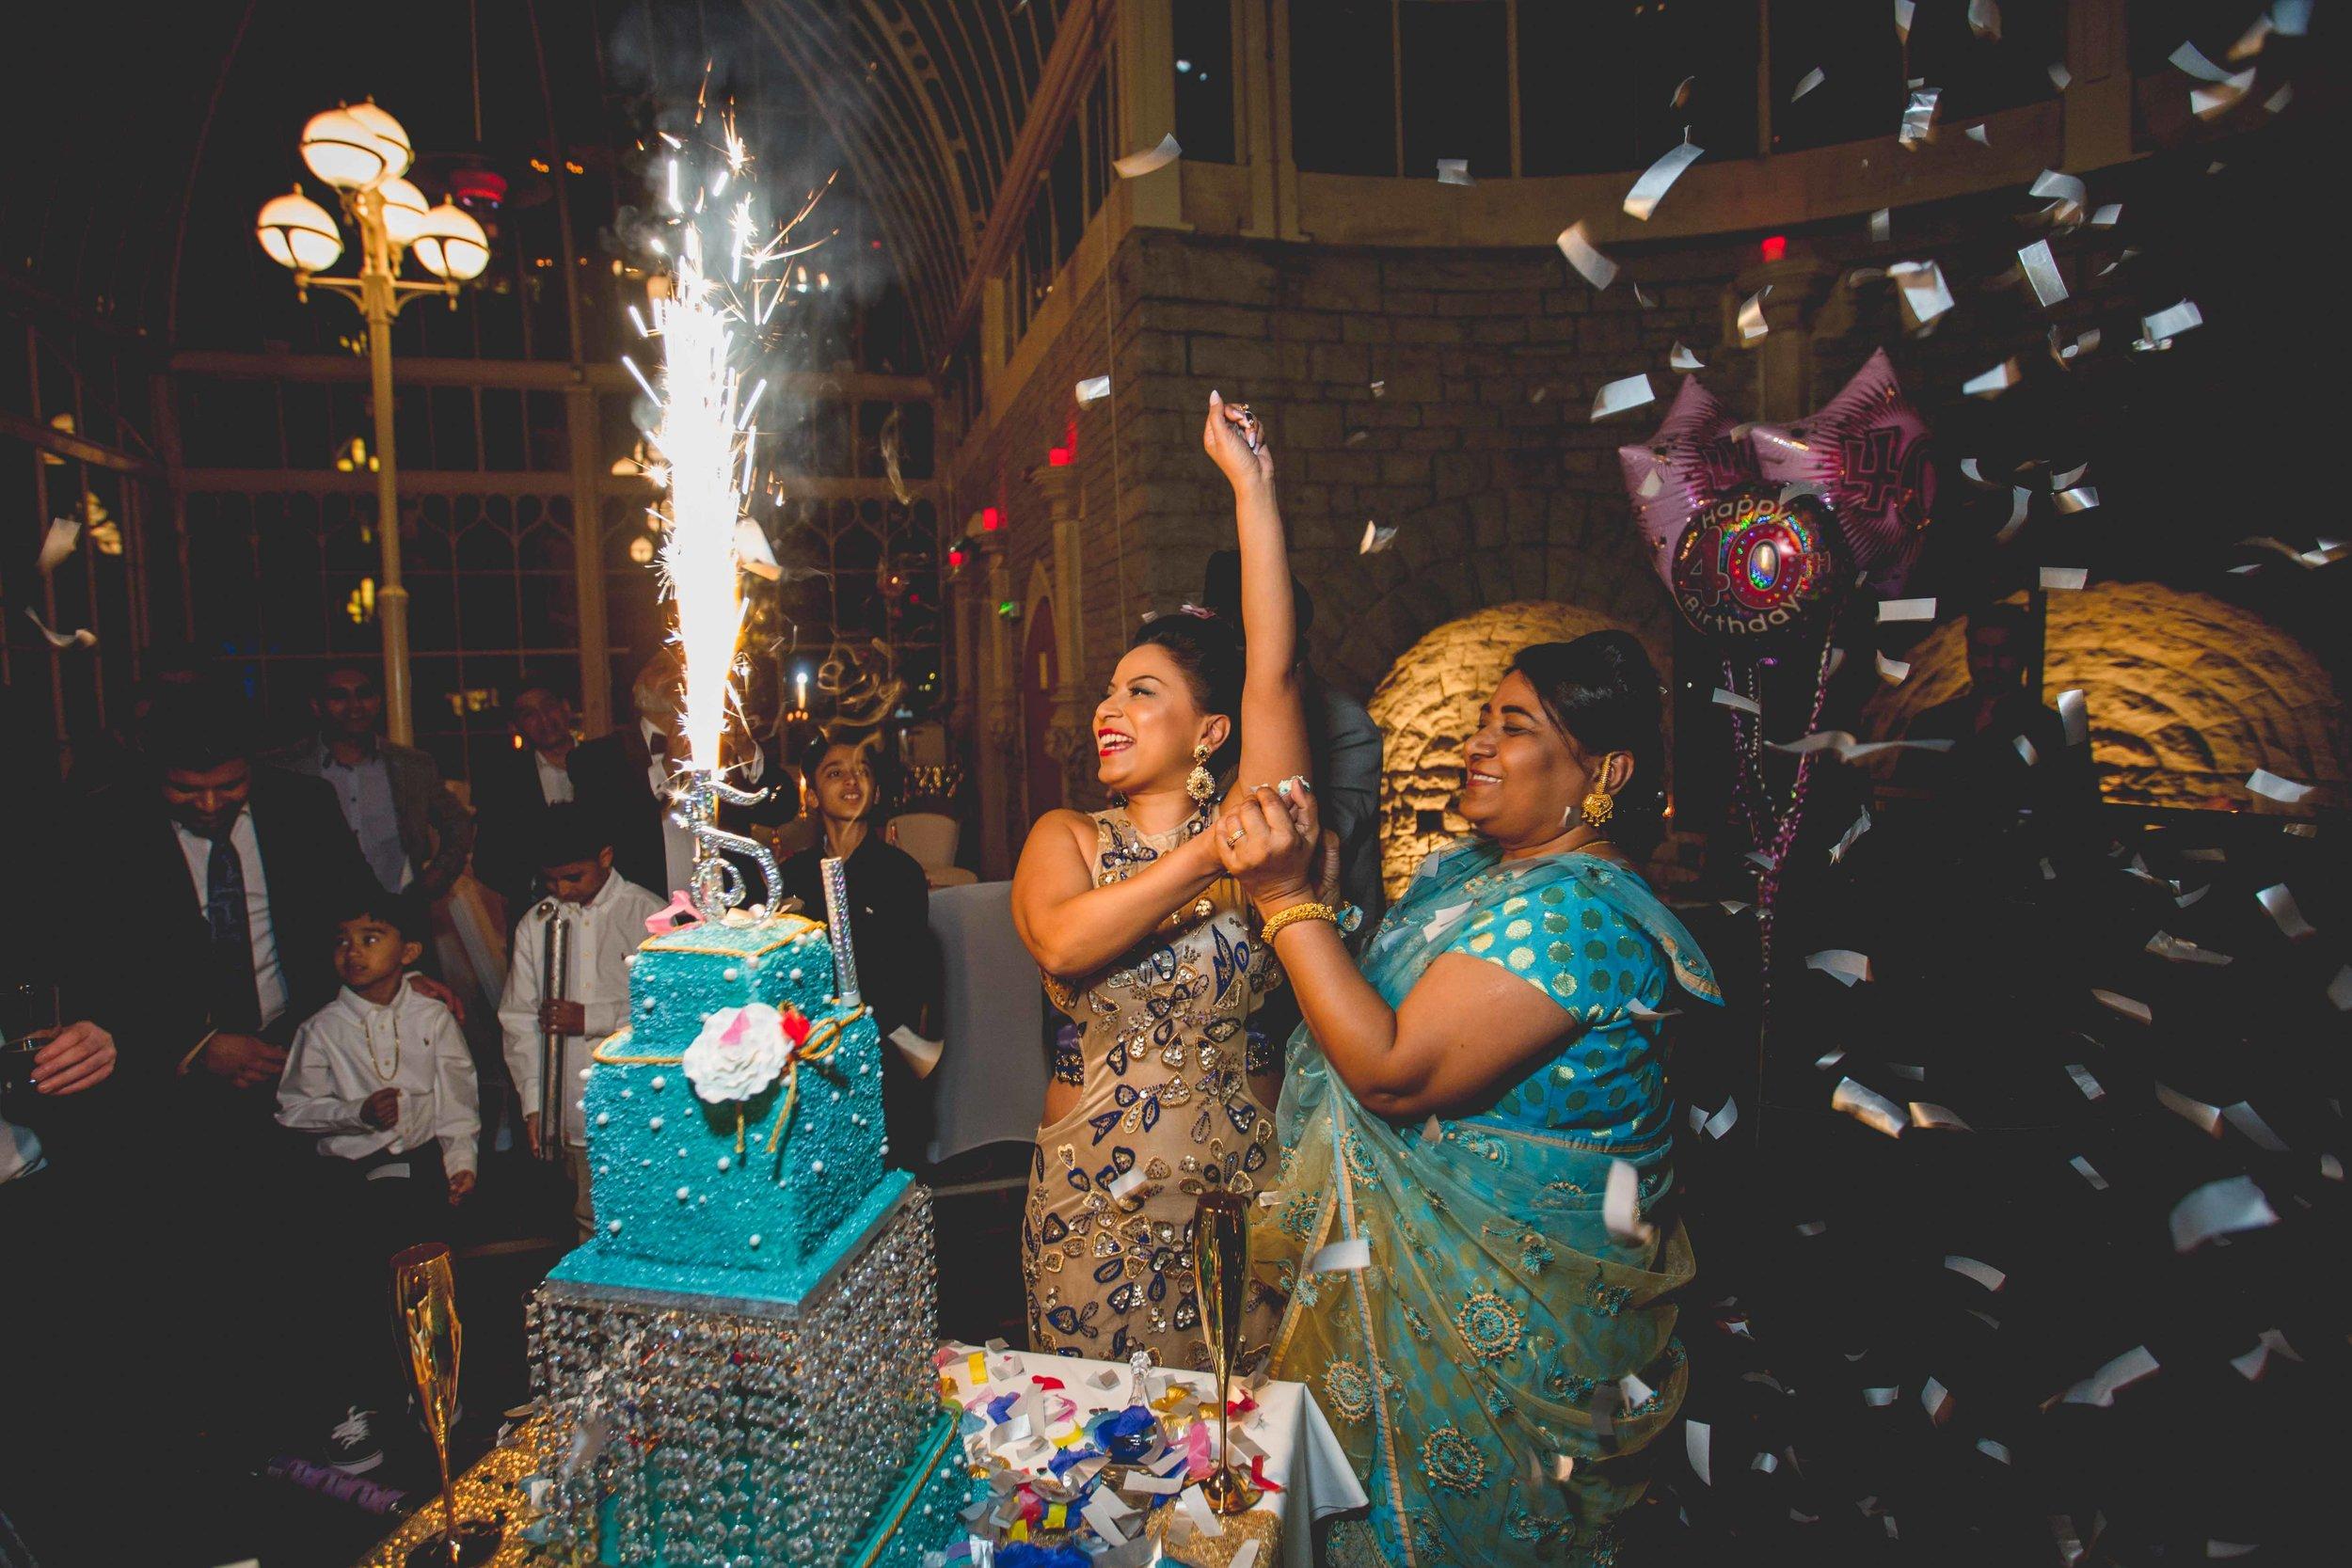 tortworth-Hotel-gloucester-birthday-wedding-photographer-natalia-smith-photography-26.jpg